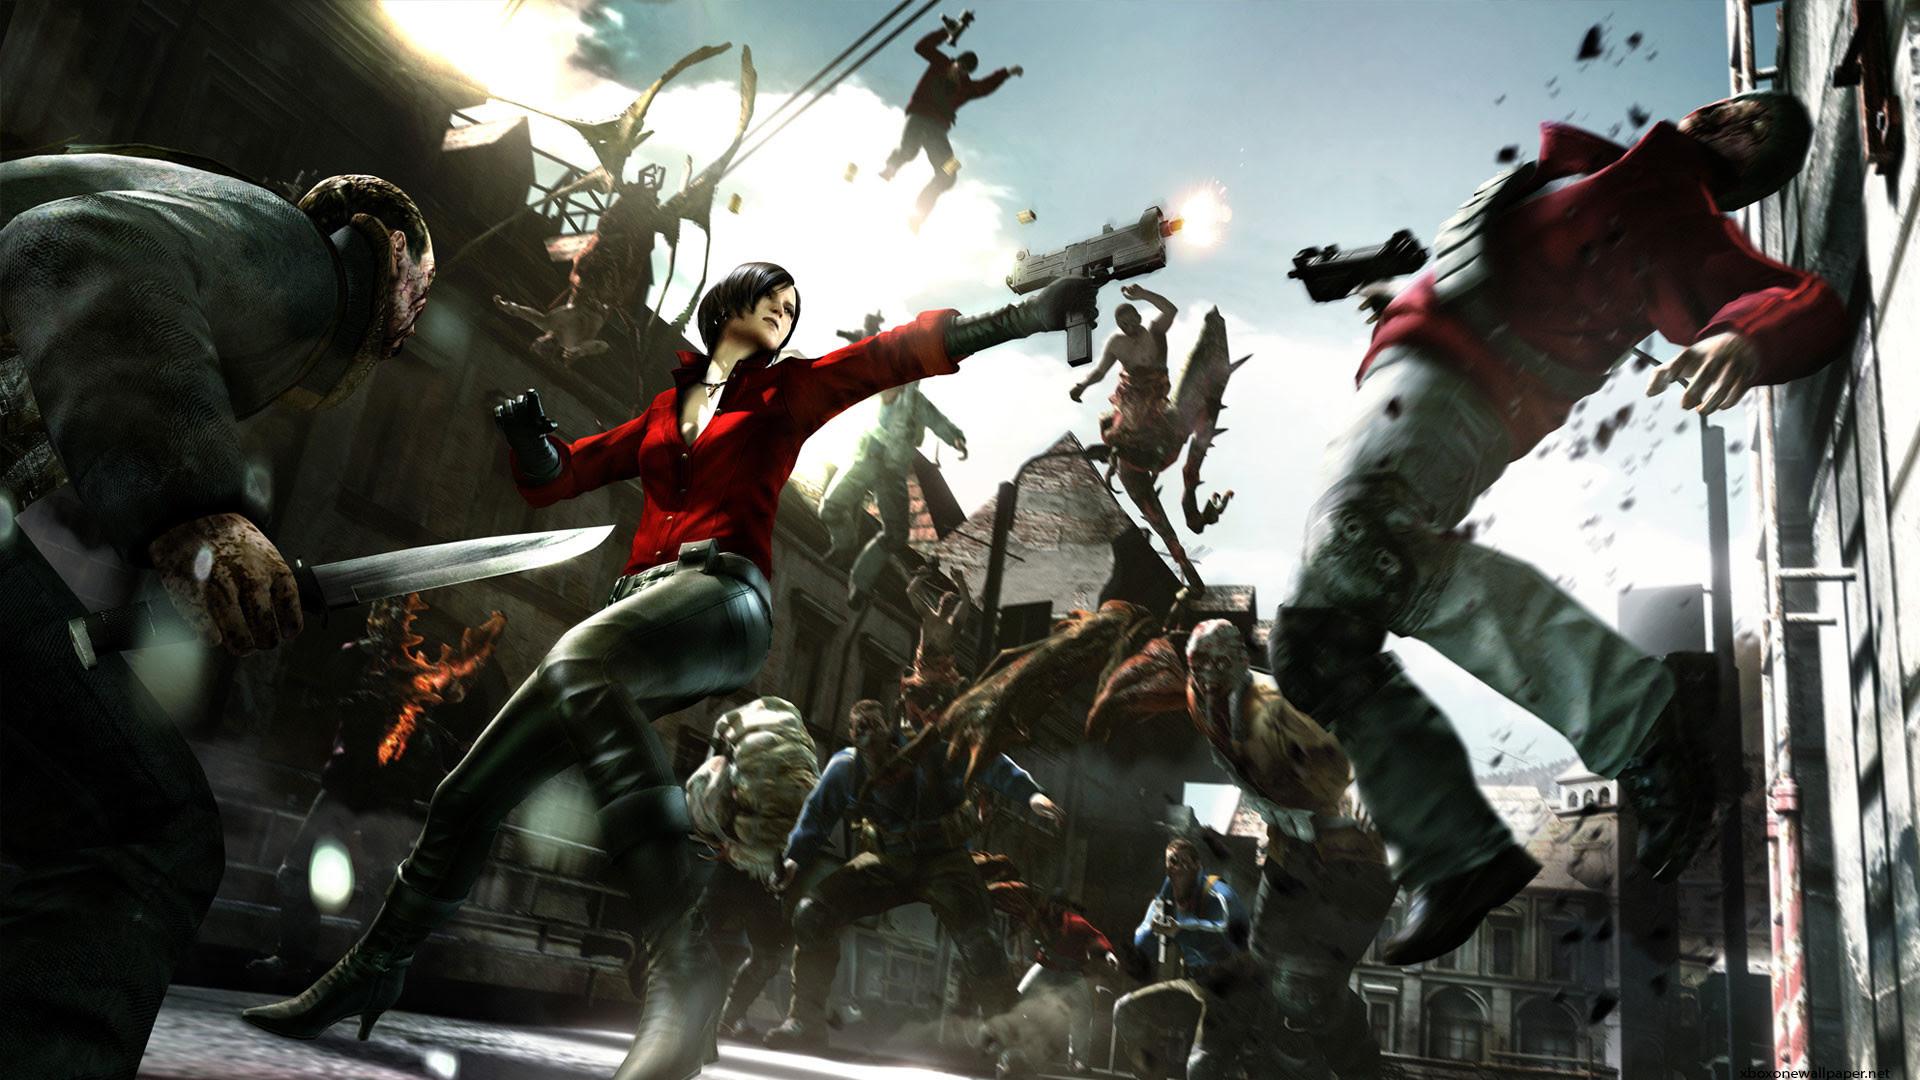 Resident Evil 3 Remake 4k Wallpaper Hd Games 4k Wallpapers